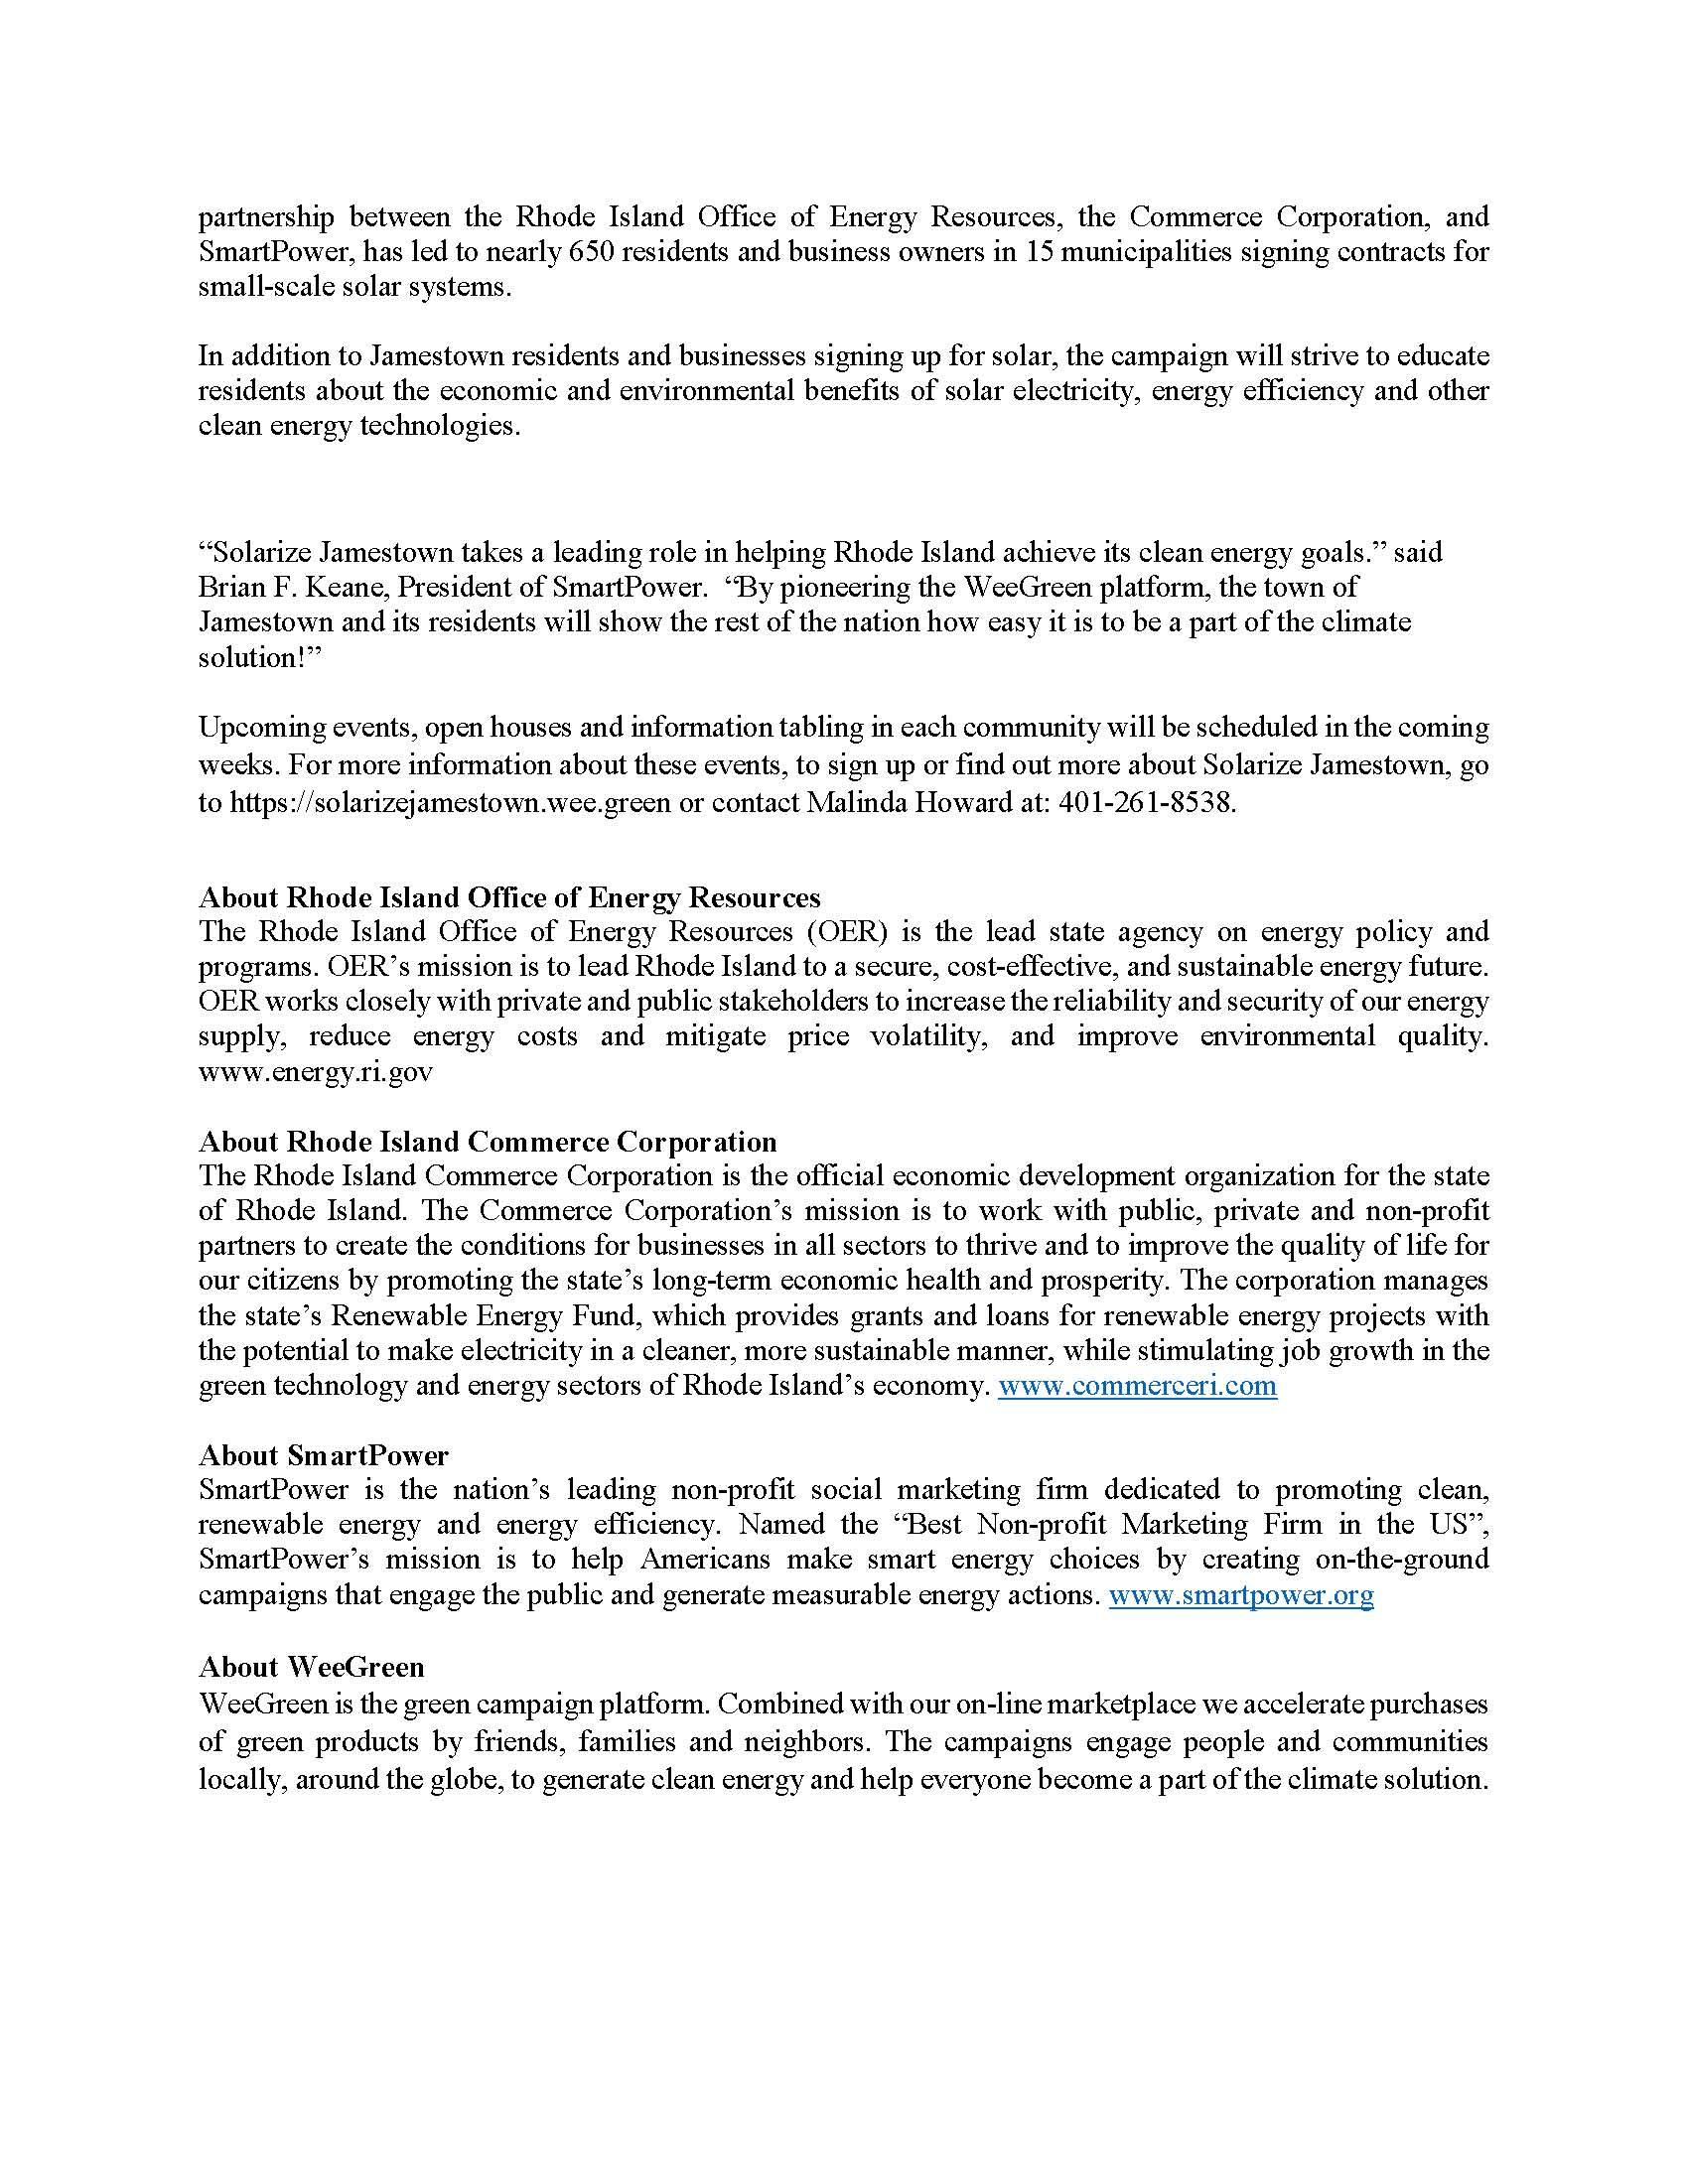 Attachment C - Solarize Jamestown Press Release_Page_2.jpg